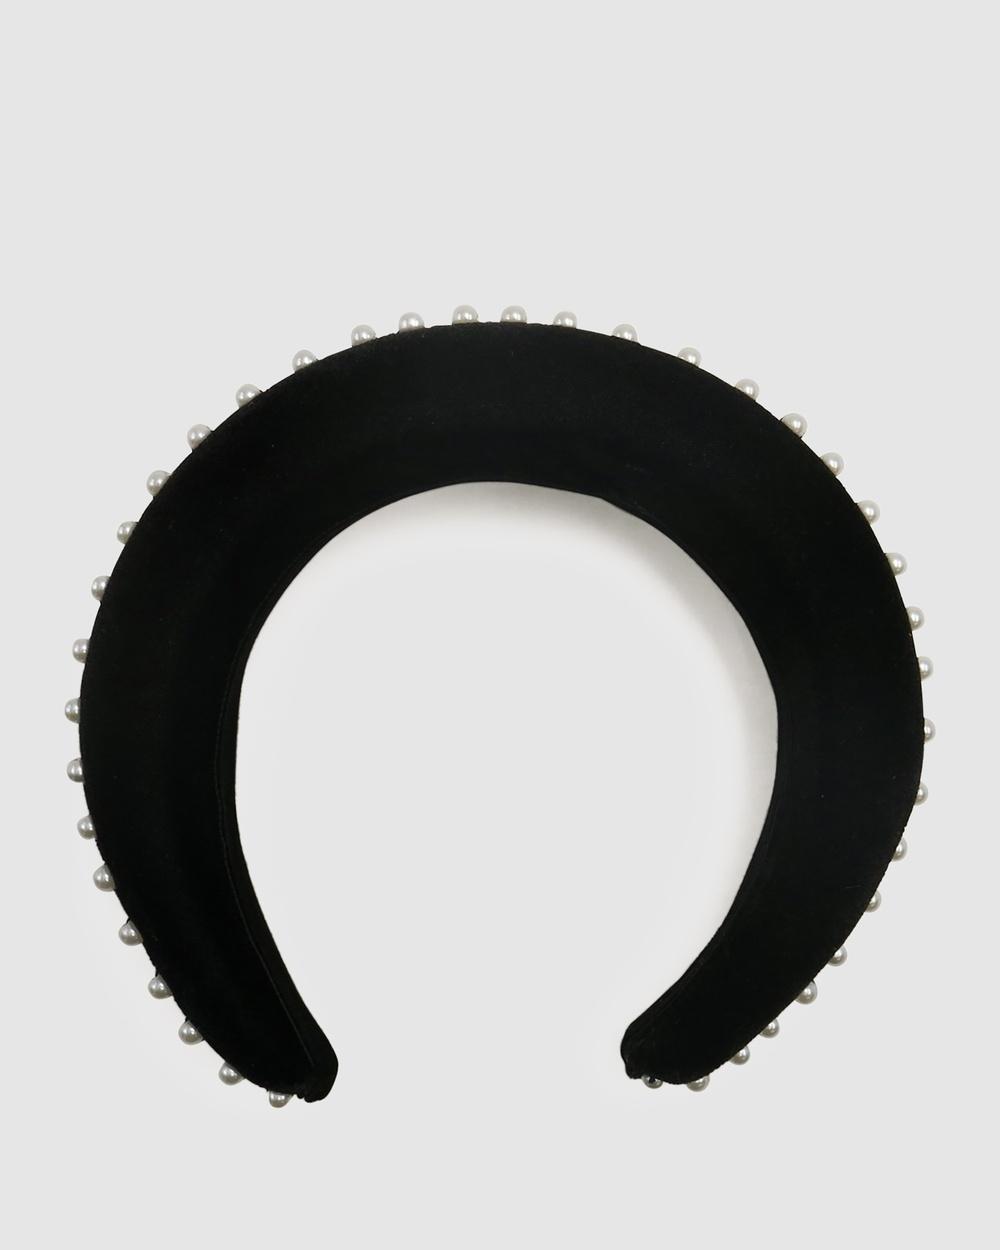 Morgan & Taylor Rania Headband Fascinators Black